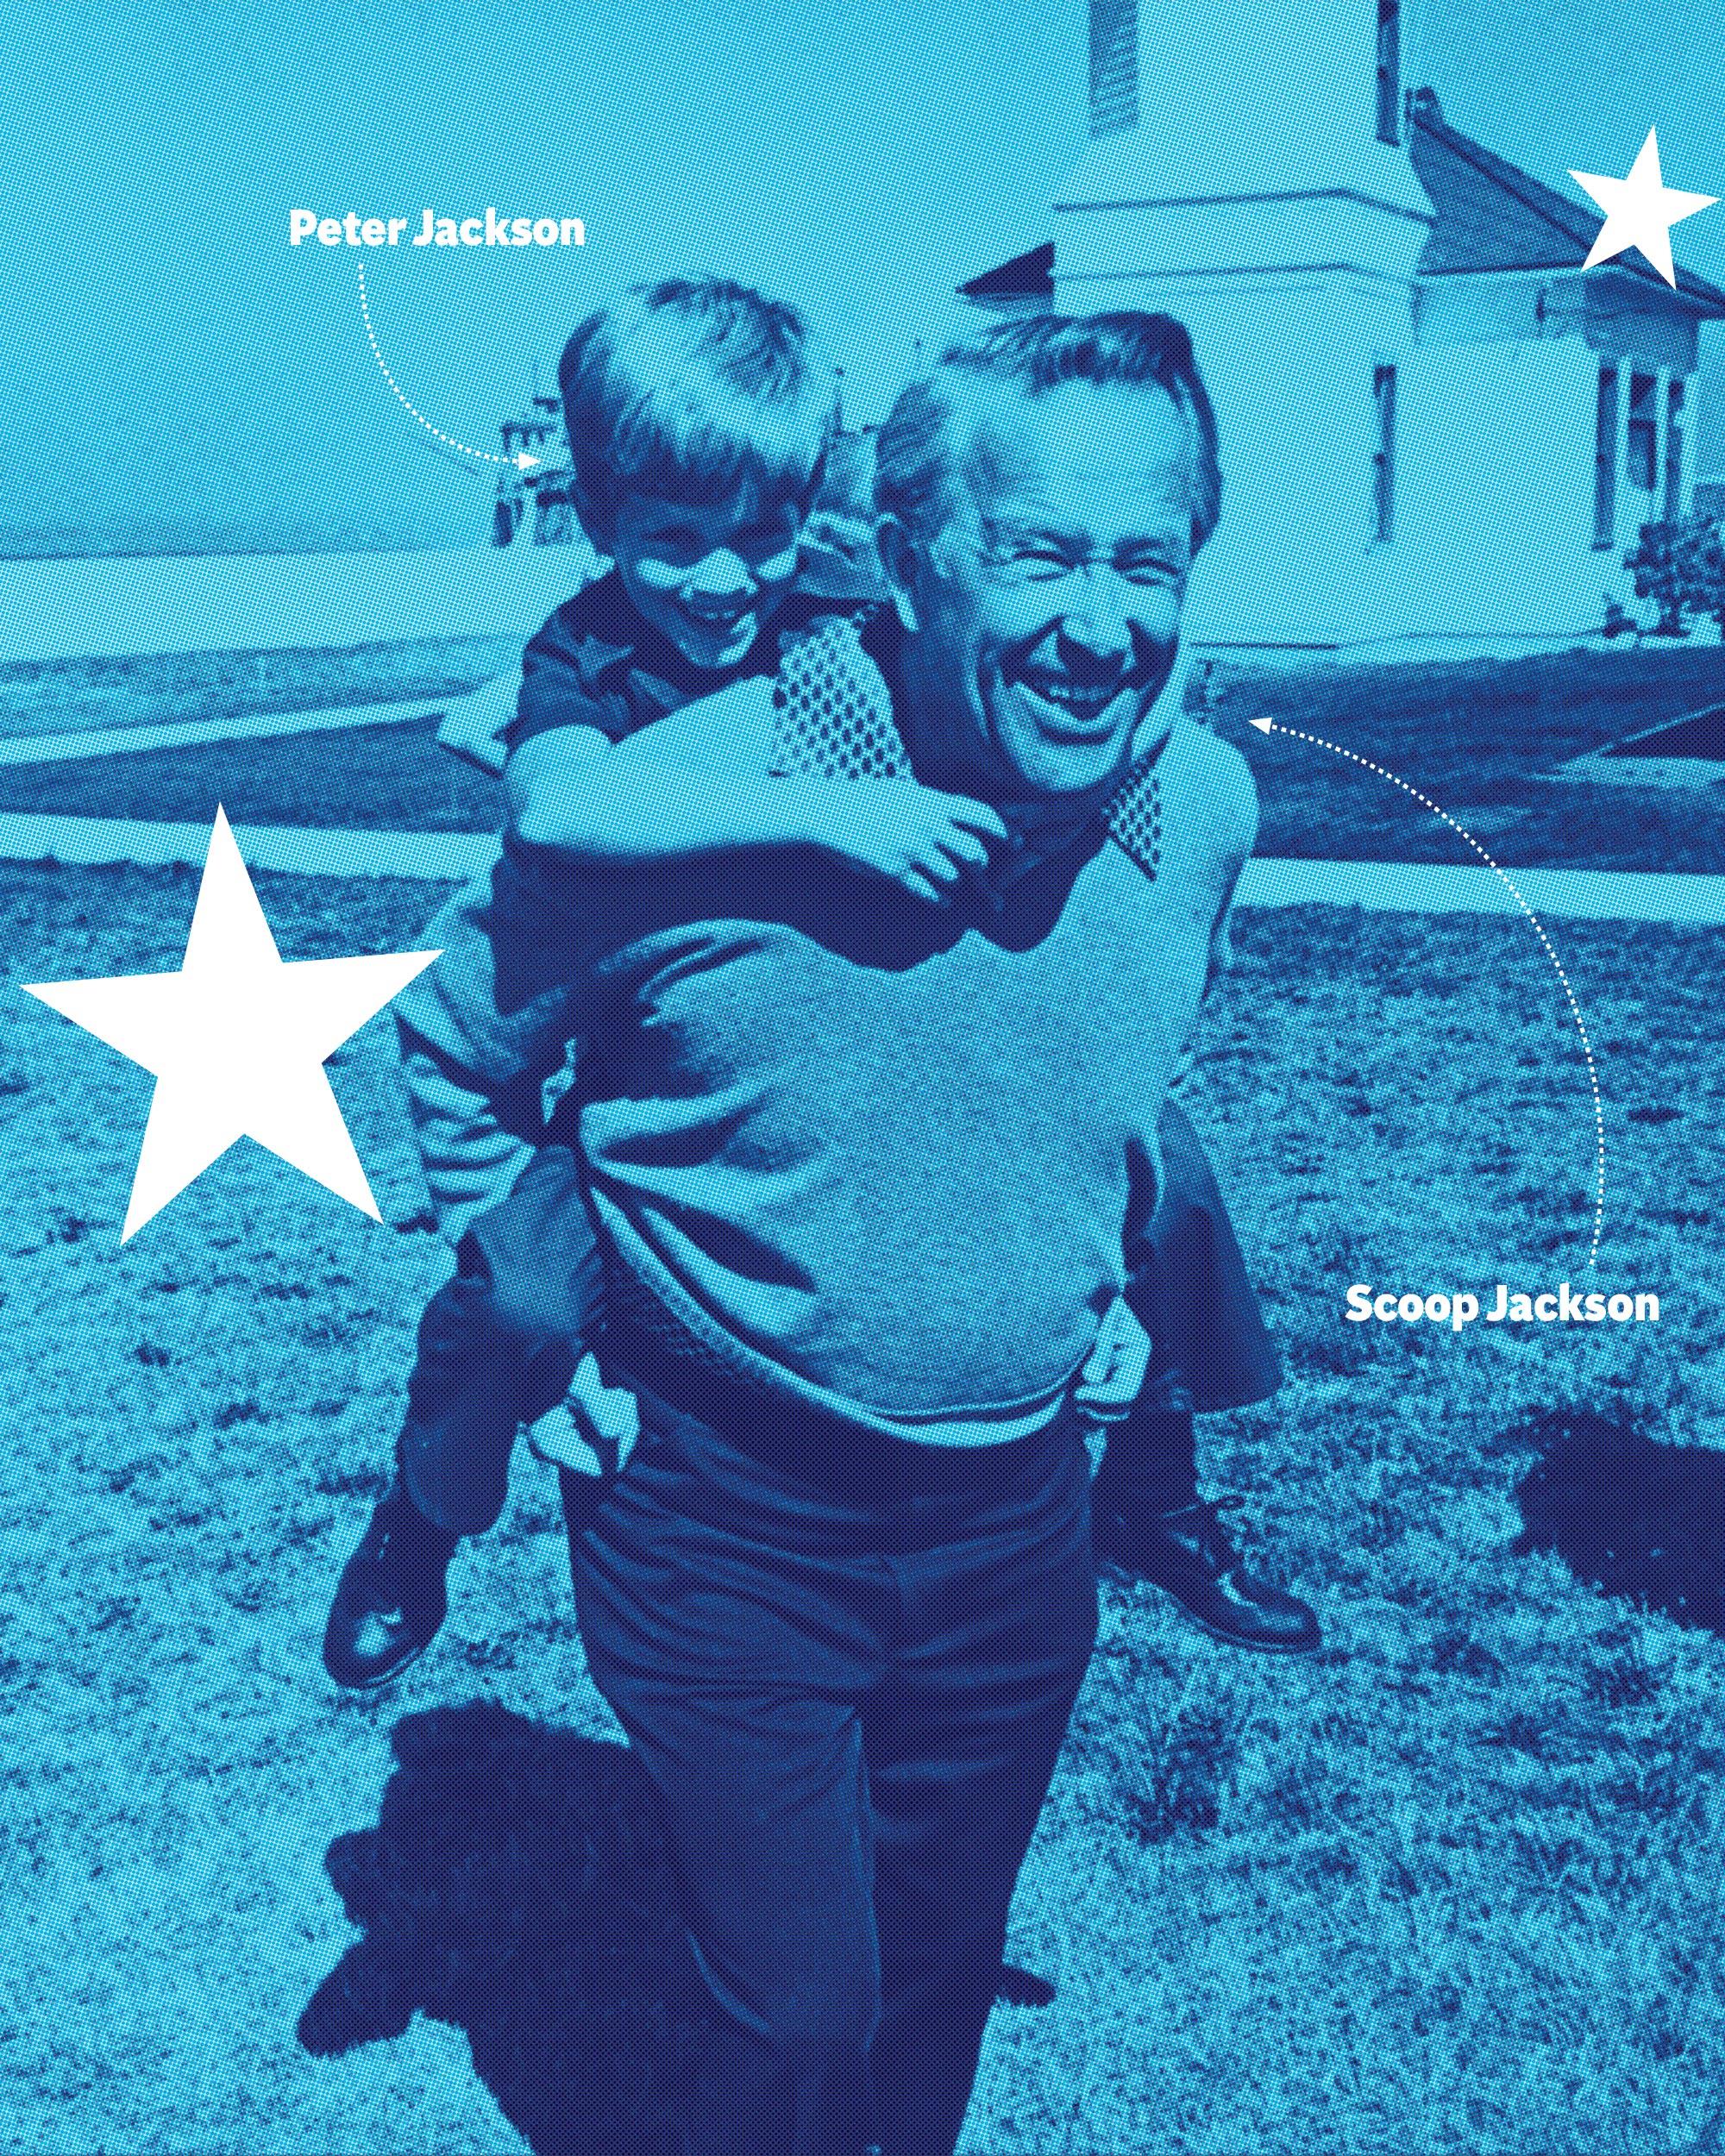 scoop jackson, henry jackson president, presidential race 1972, presidential race 1976, democratic convention, 1972, 1976, peter jackson, peter hardin jackson